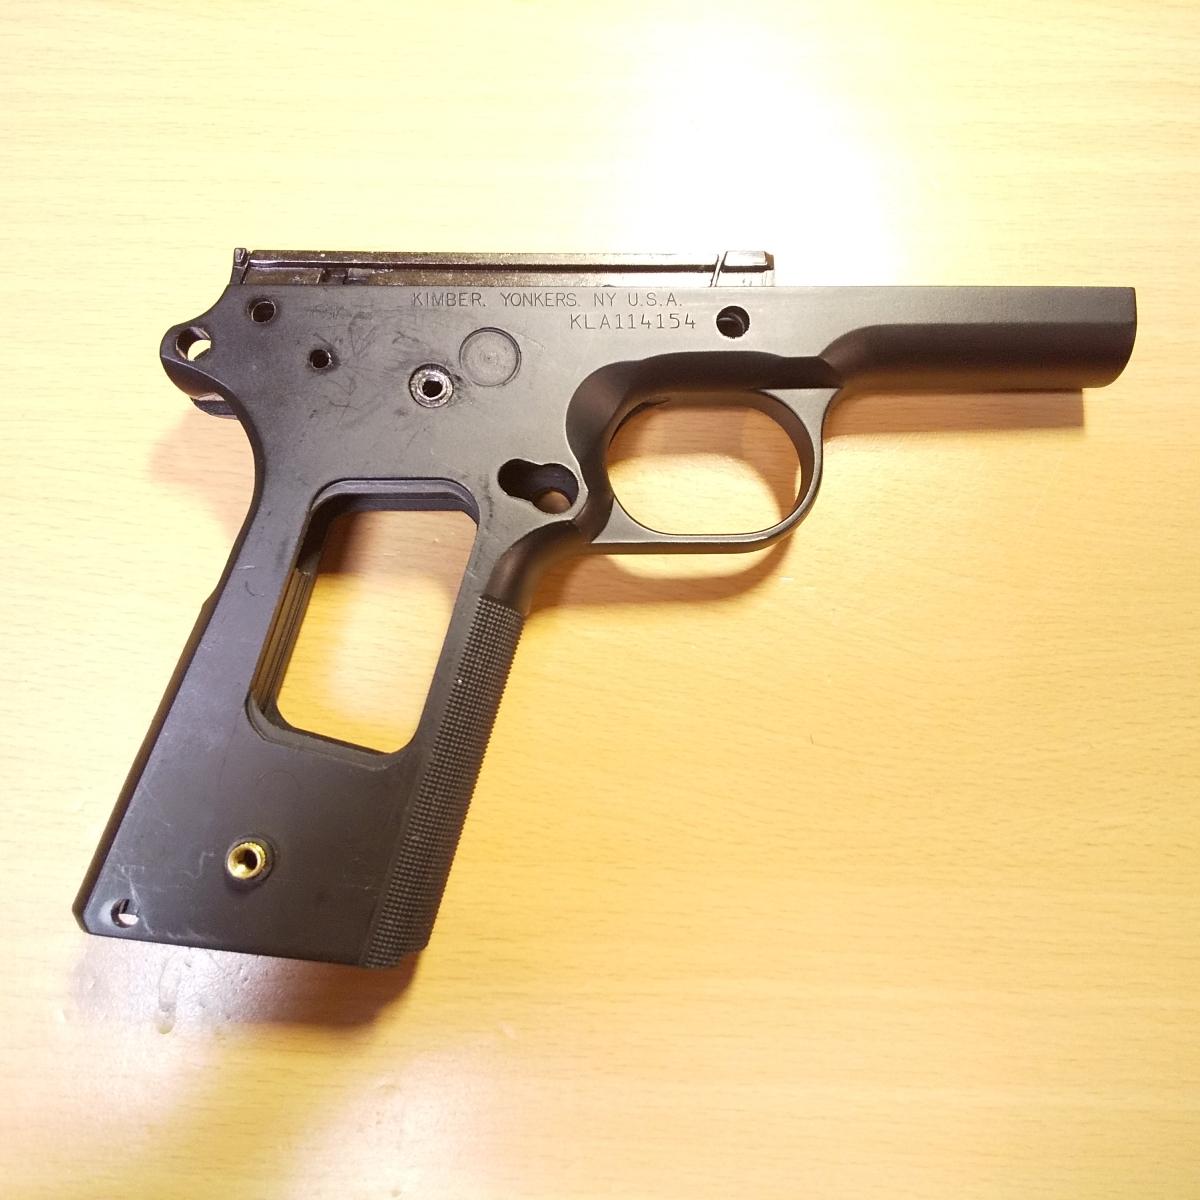 WA SCW キンバー LAPD SWAT CUSTOM II Ver.3 HW フレーム アッセンブリー 一式/1911 ガバメント MEU コルト ウイルソン Prime_画像2